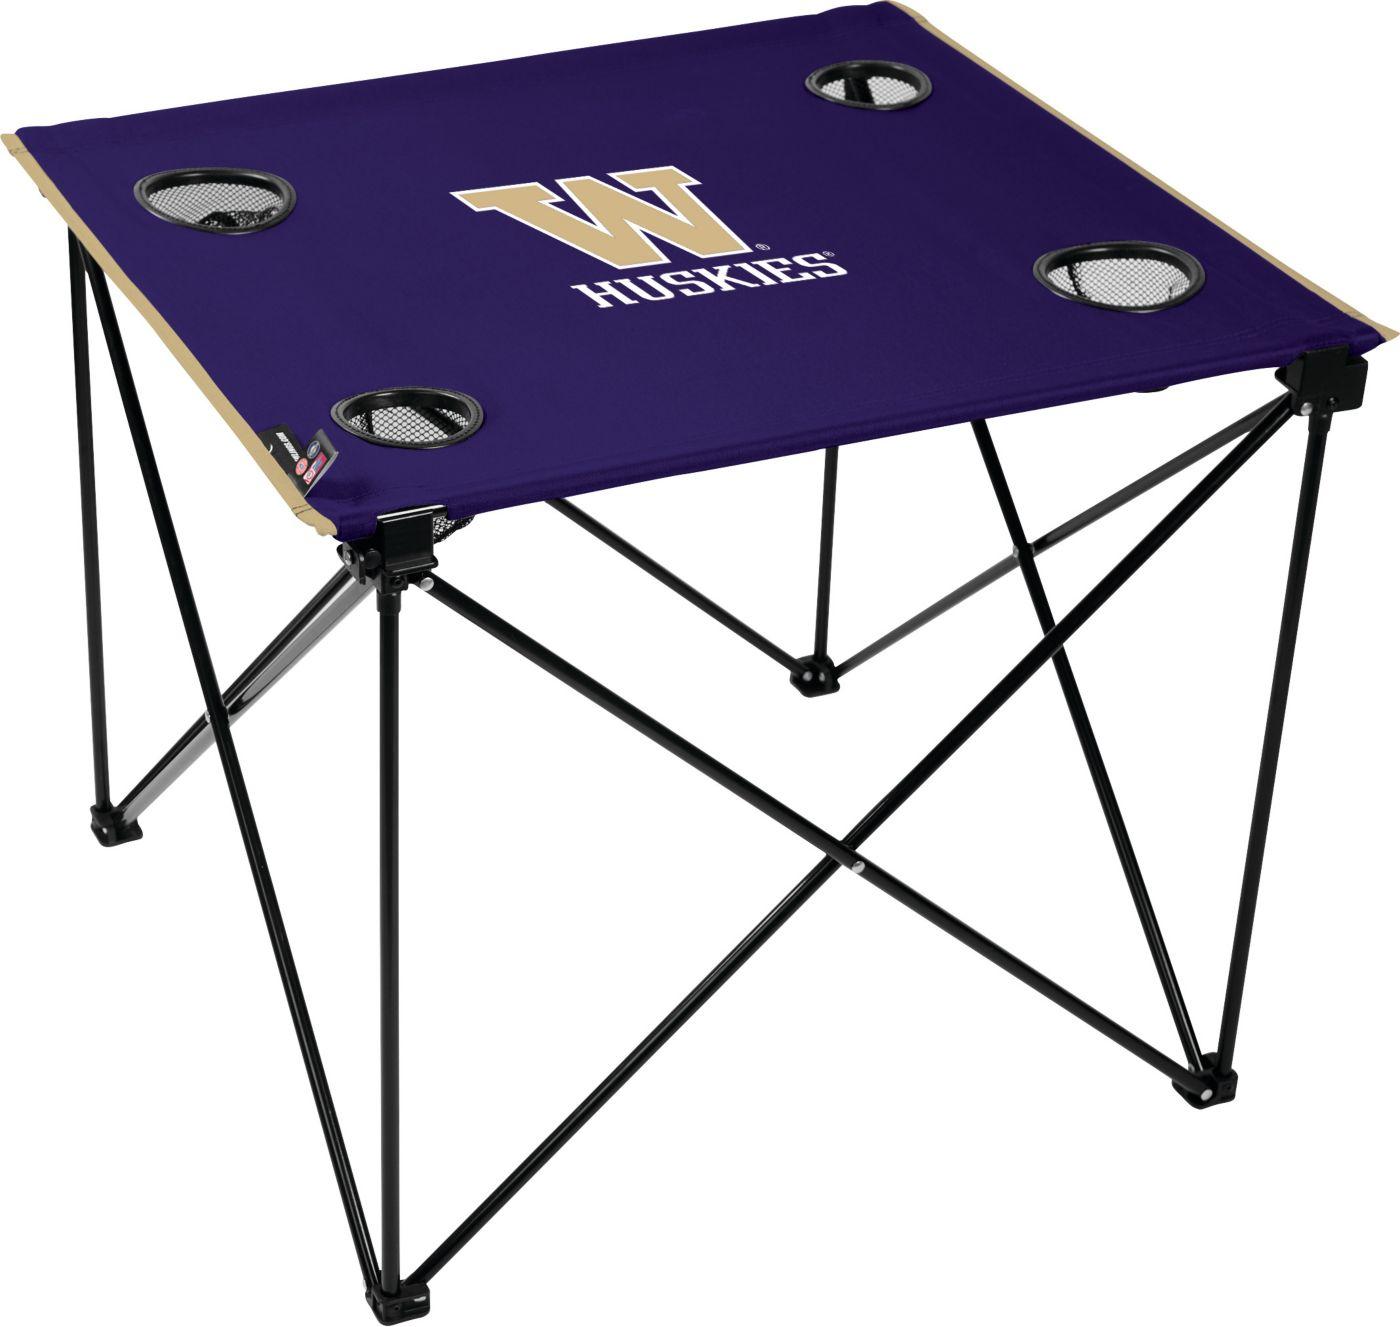 Rawlings Washington Huskies Deluxe TLG8 Table